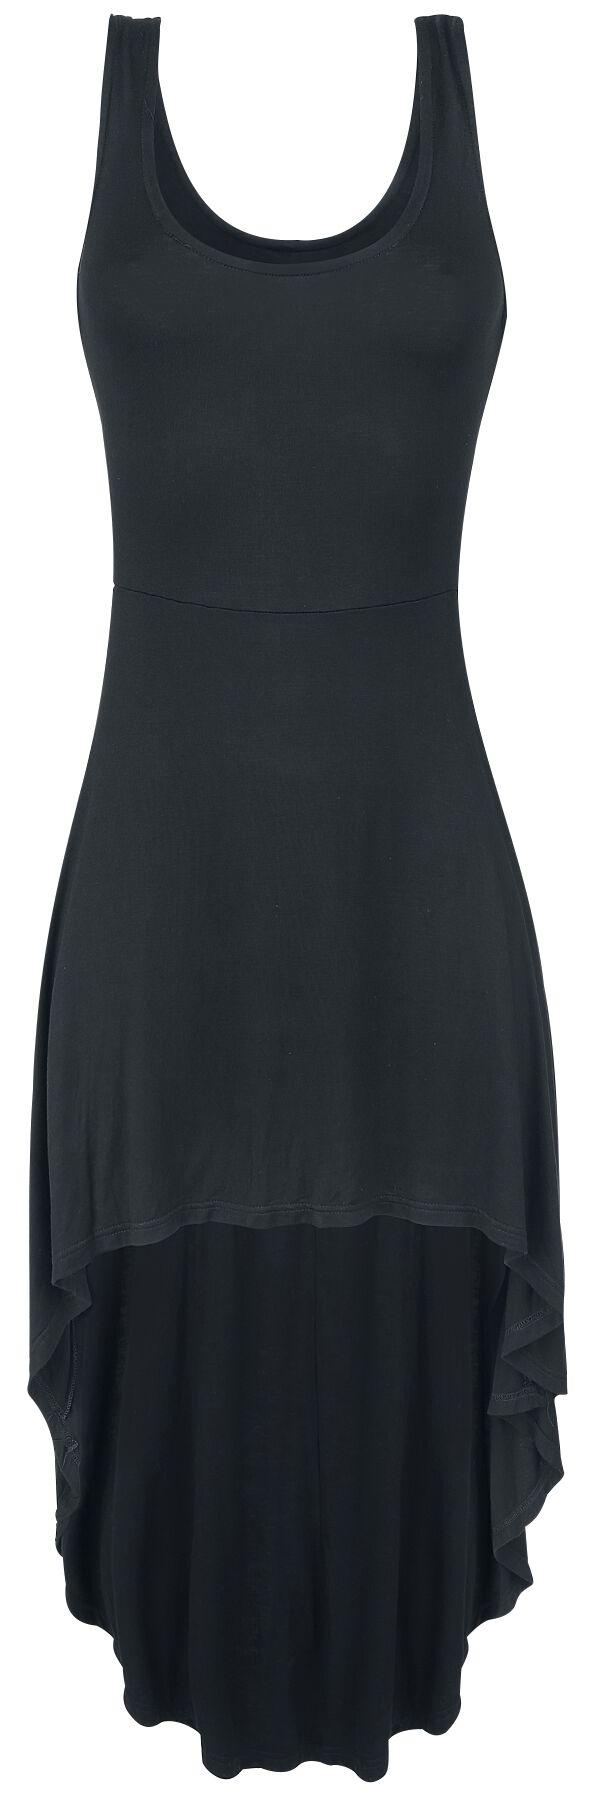 Gothicana by EMP To Make A Long Story Short Short dress black